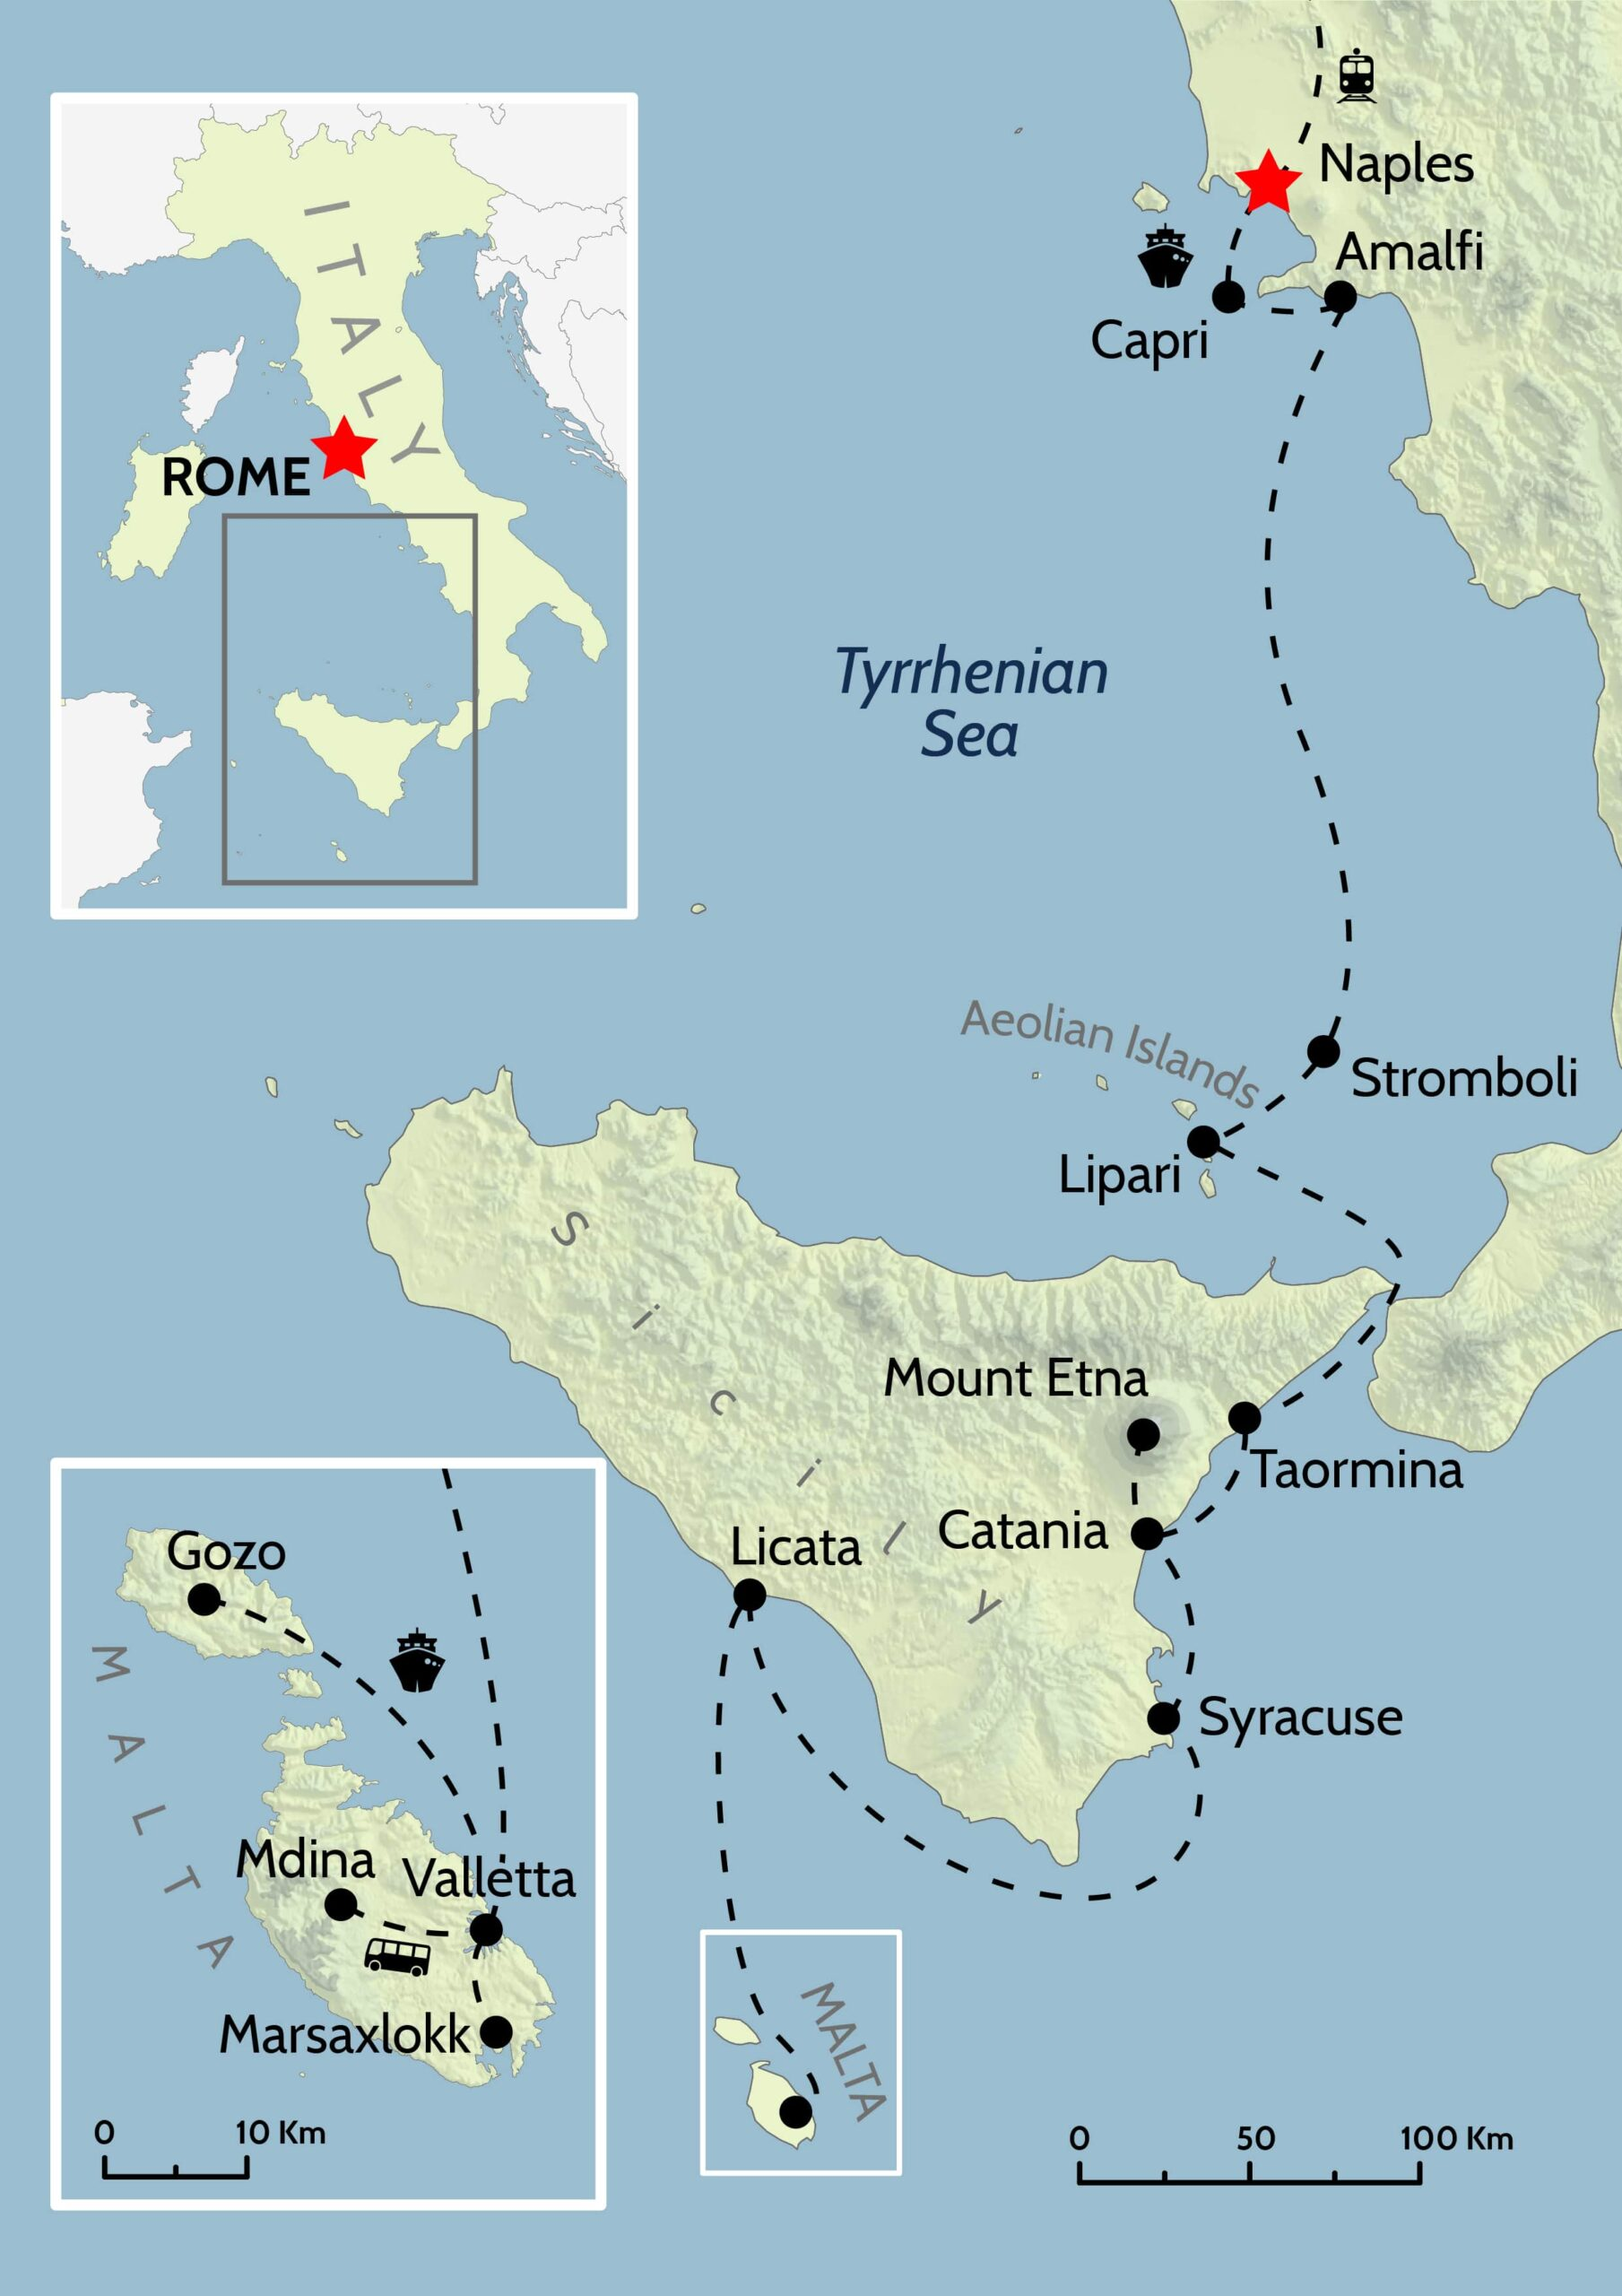 Italy_Sicily_Malta_map-01-min